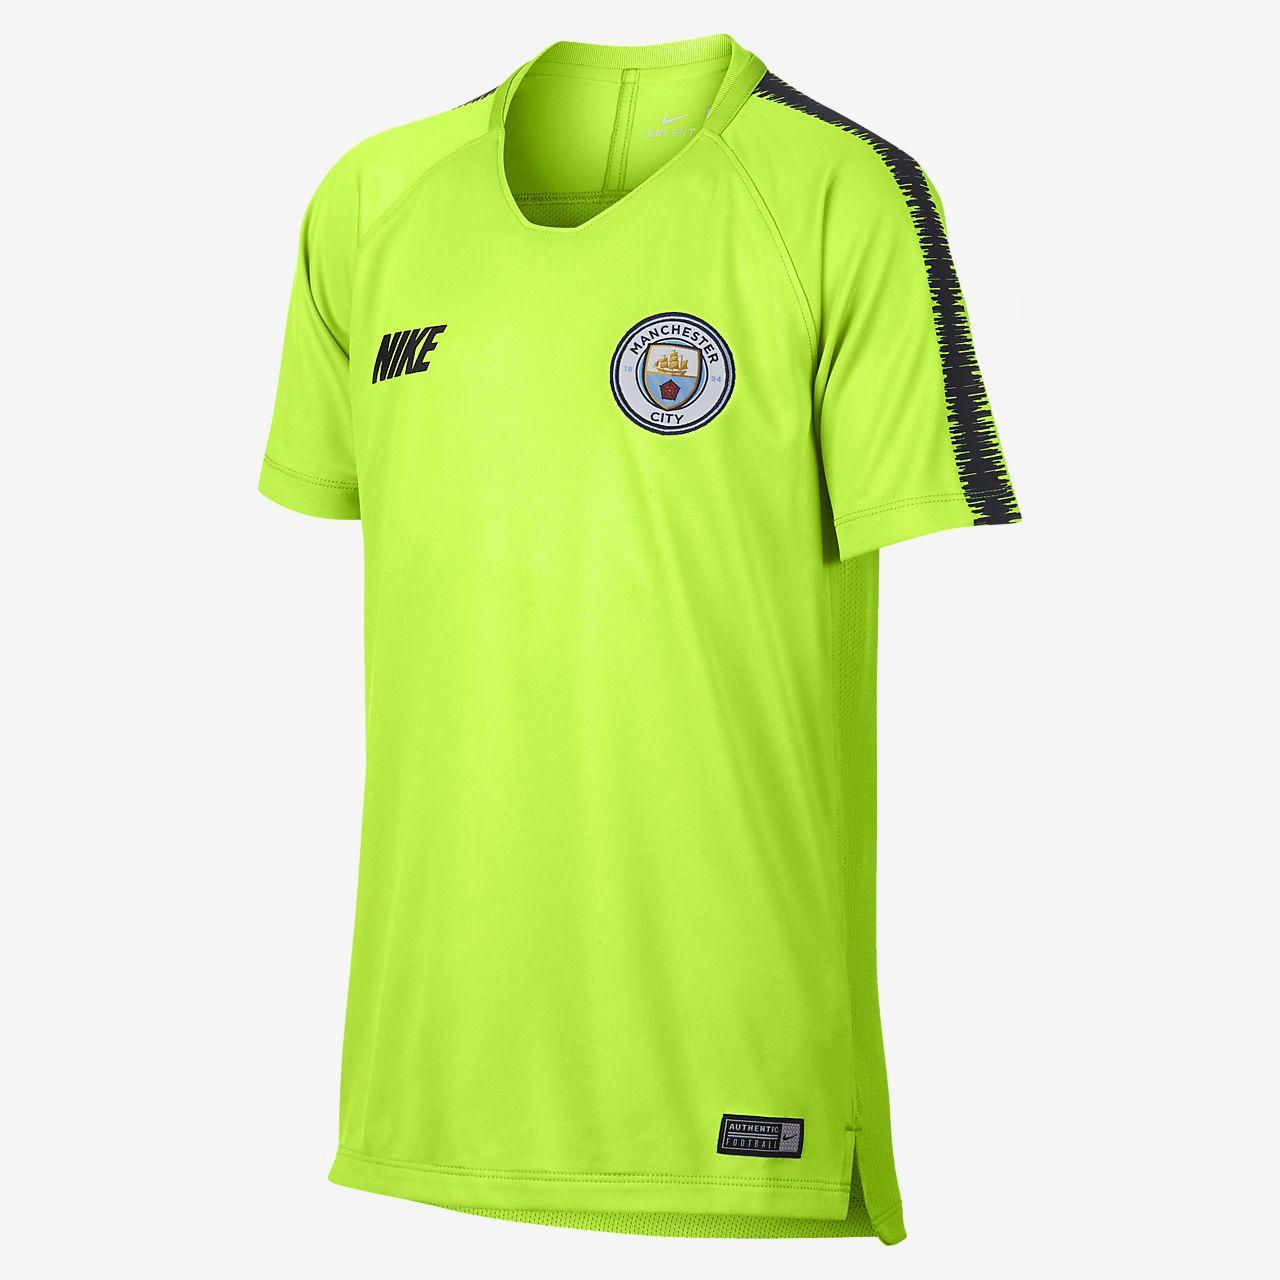 37b306e1dc78 ... Ποδοσφαιρική μπλούζα Manchester City FC Breathe Squad για μεγάλα παιδιά